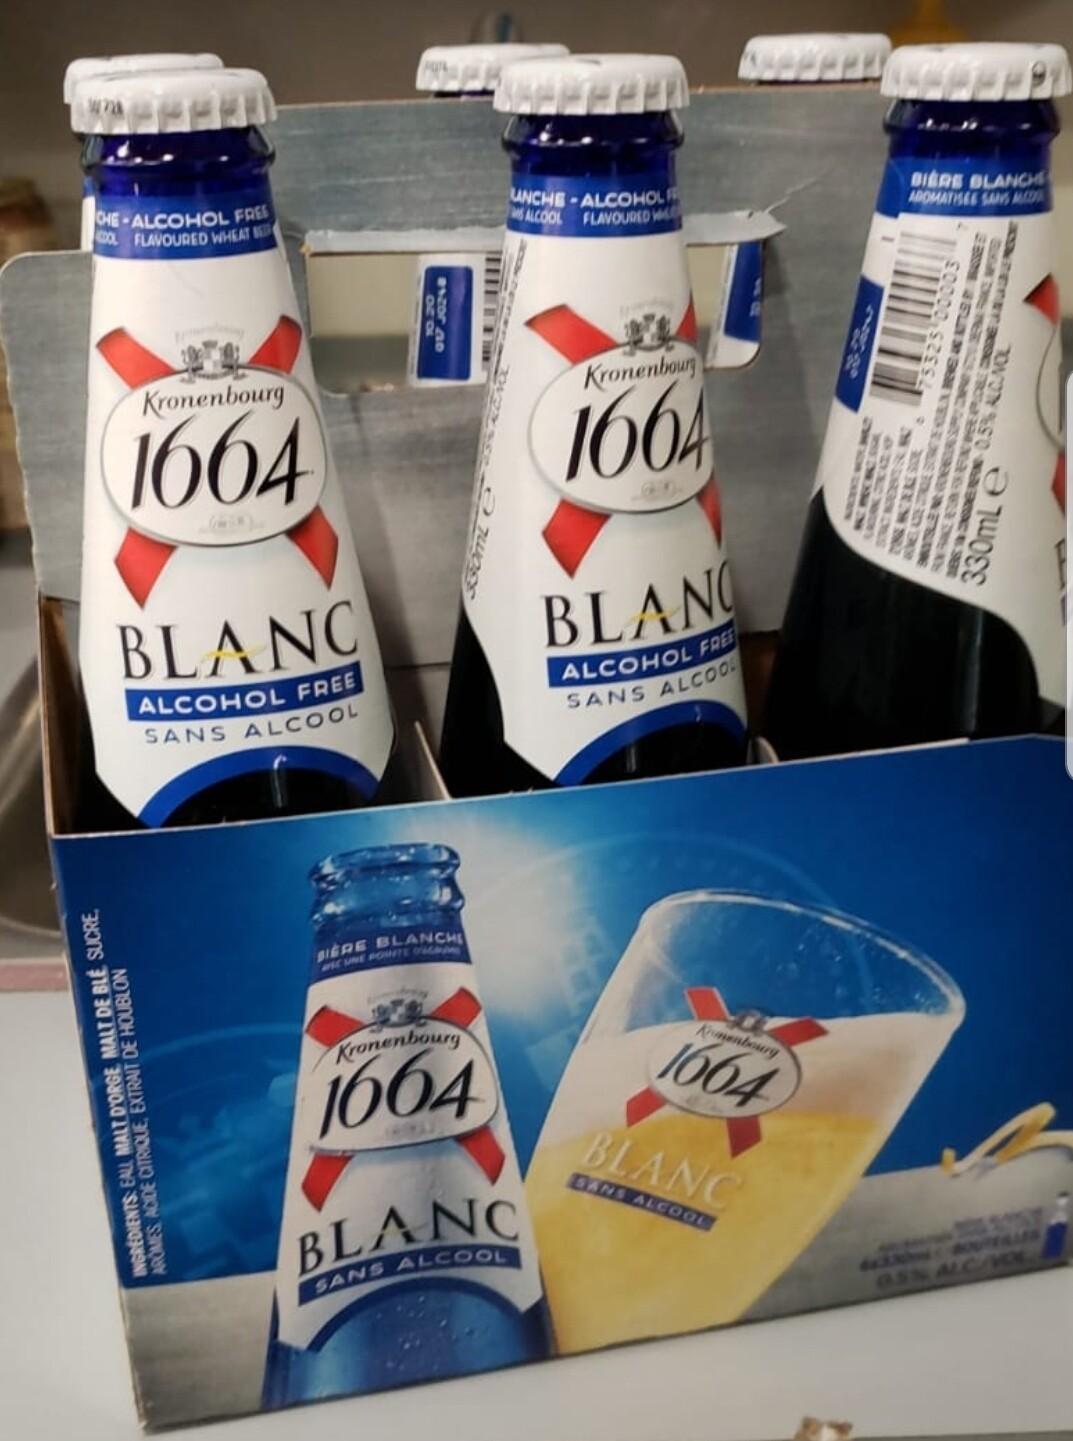 1664 Blanche sans Alcool